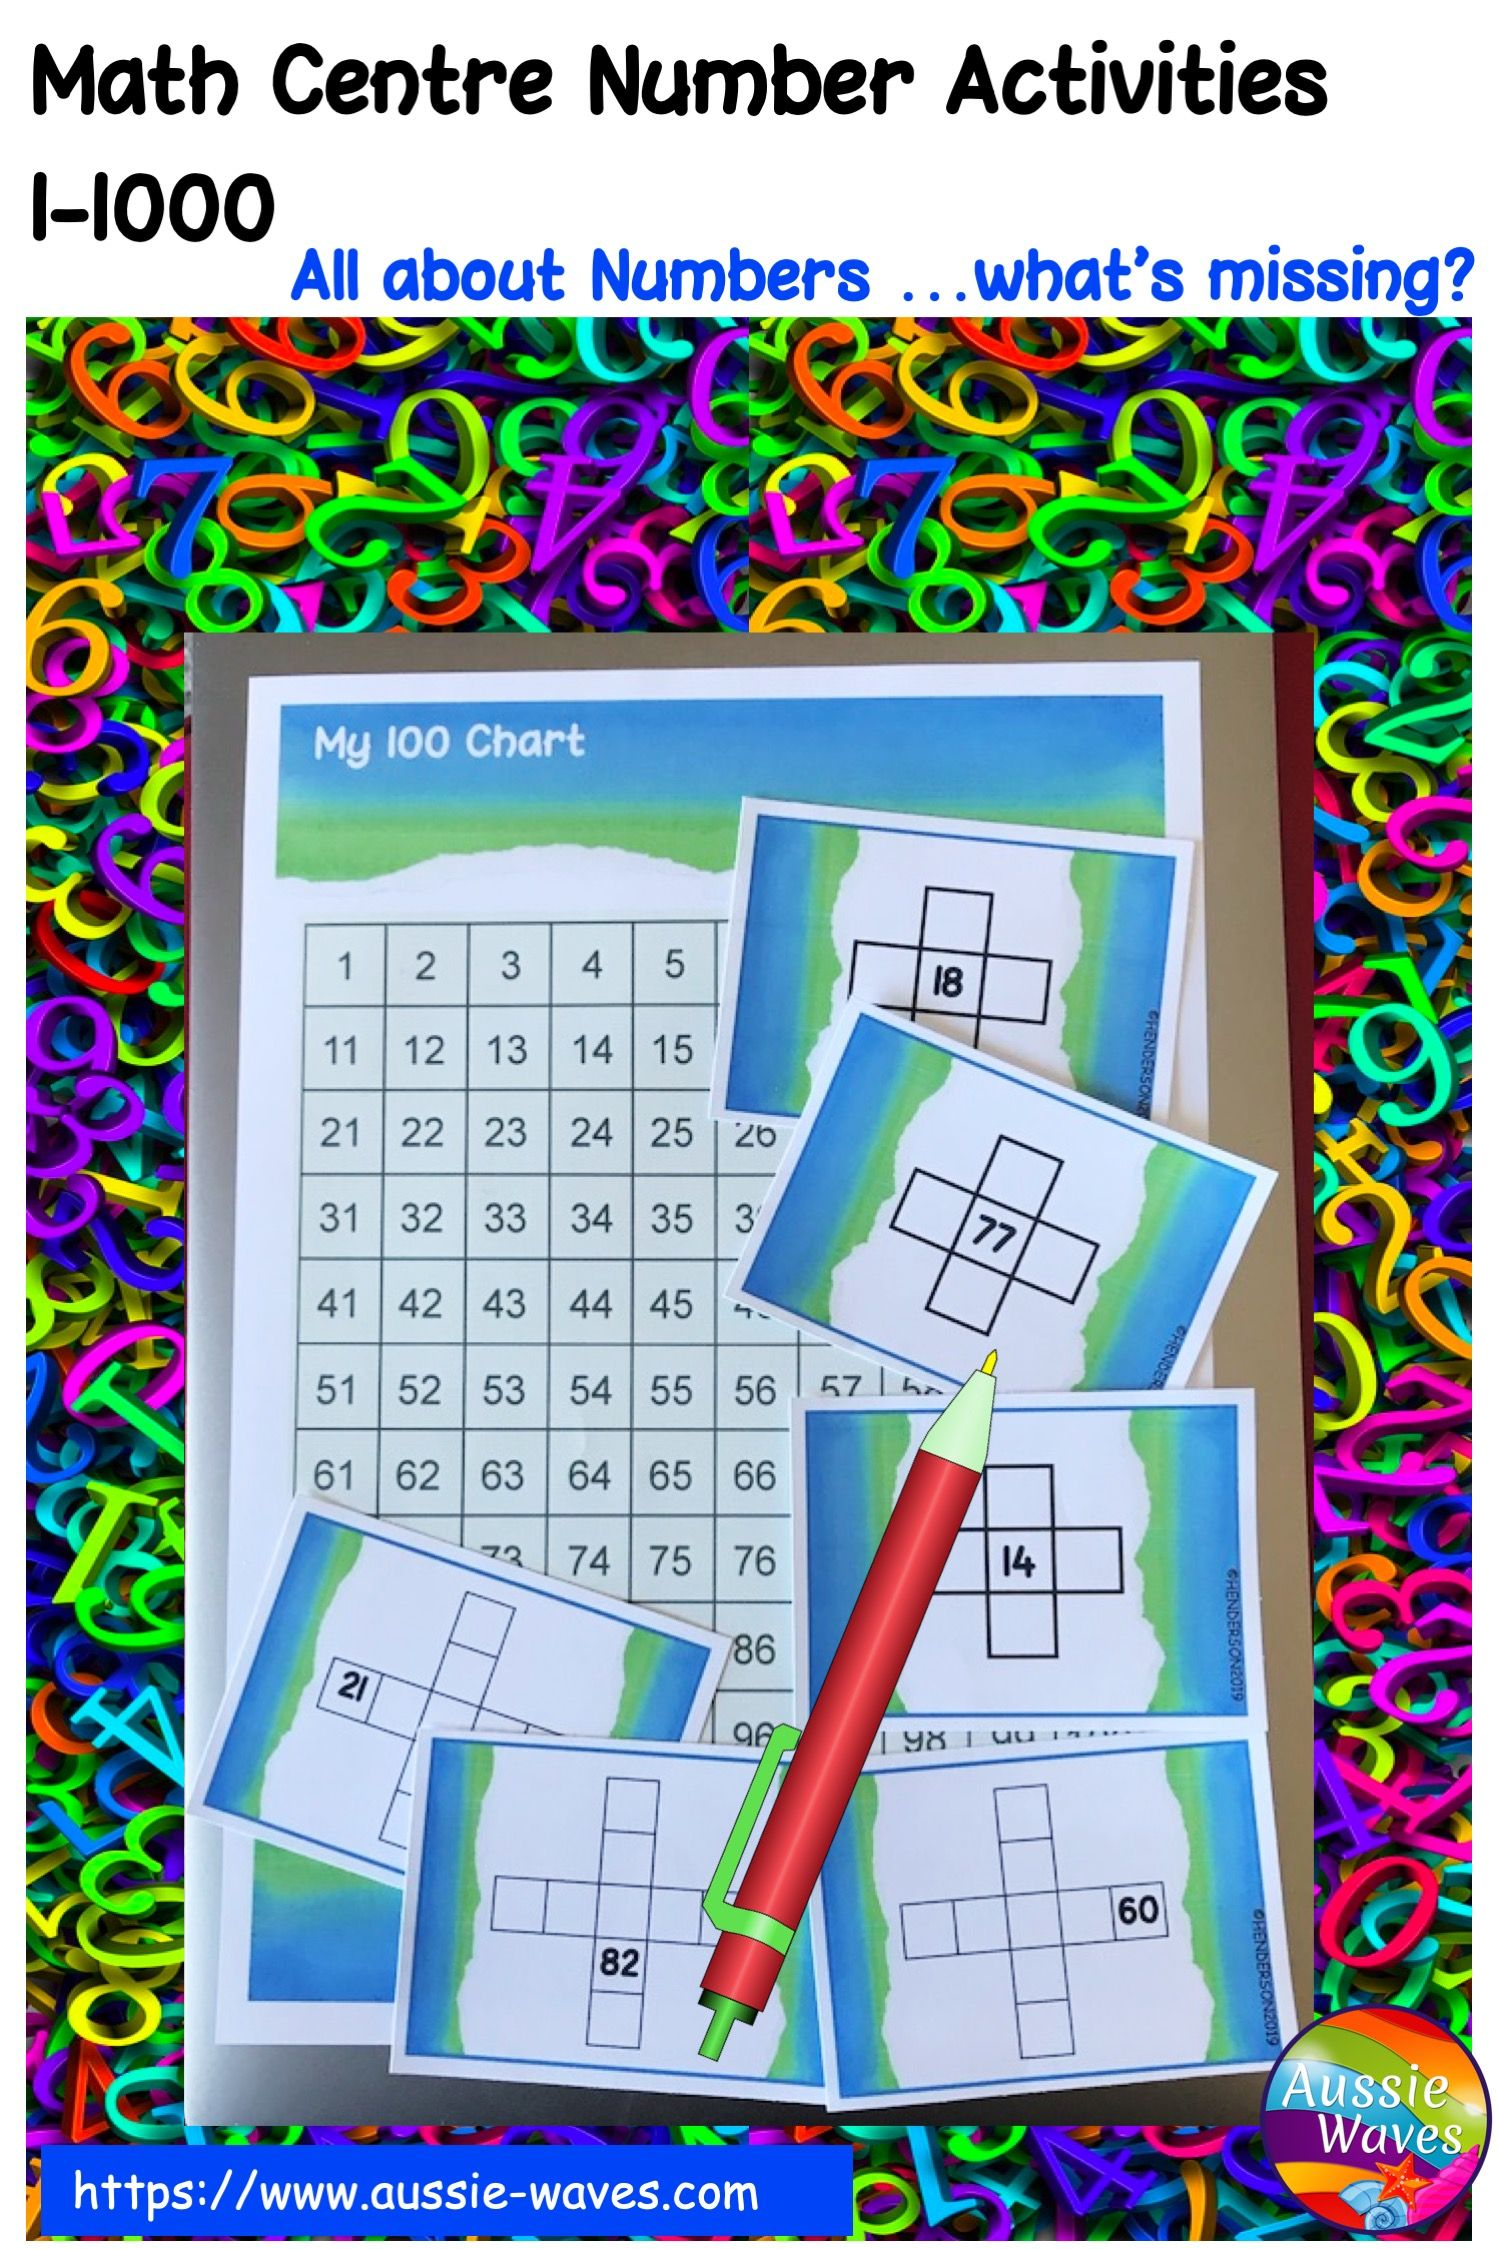 Number Patterns Math Centre Activities